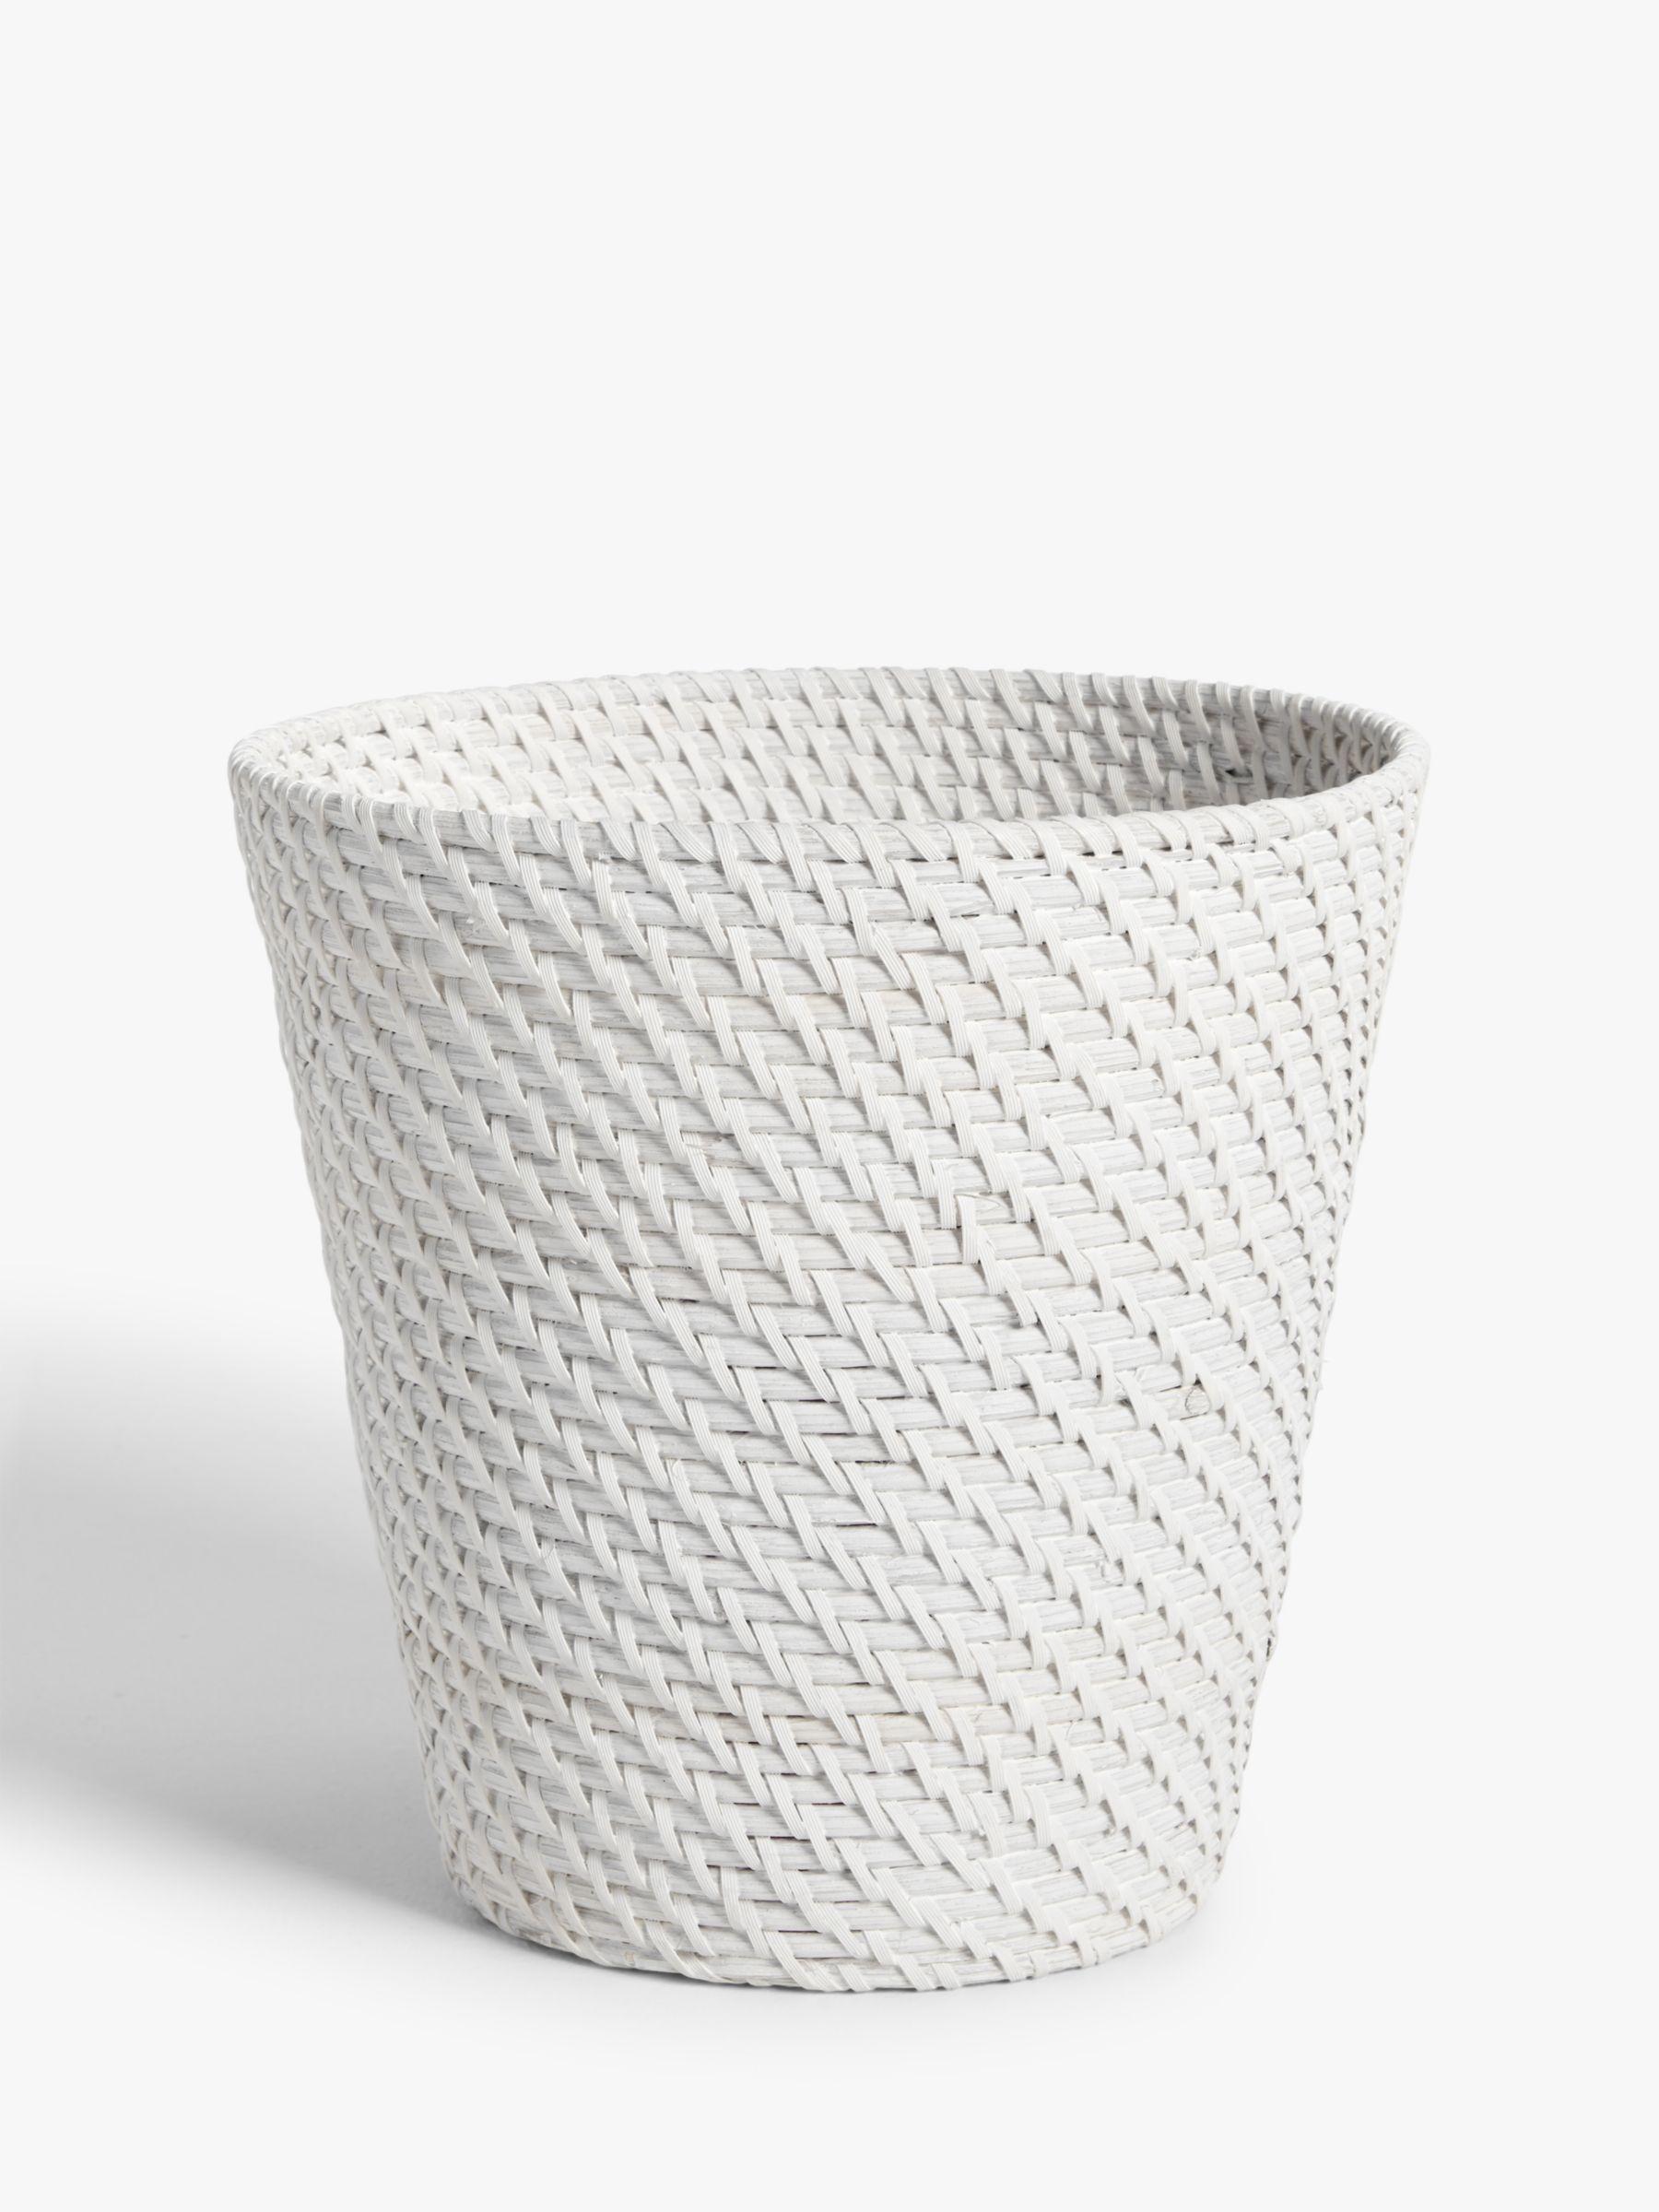 John Lewis & Partners Modern Country Rattan Waste Paper Bin, White